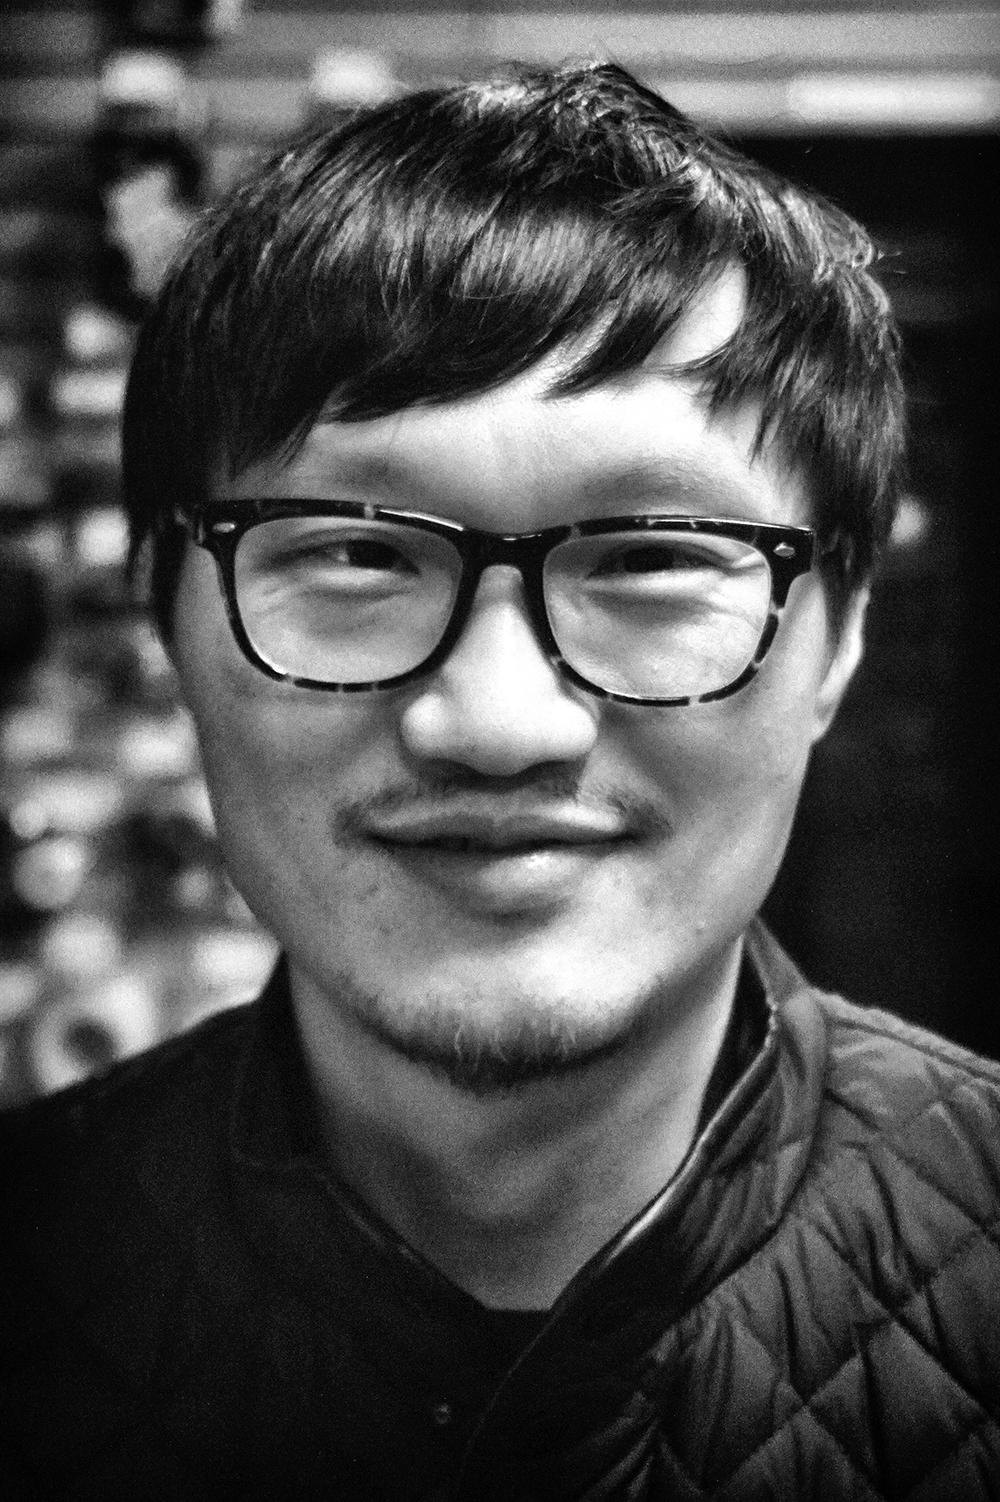 MJ Lee - Sound Engineer